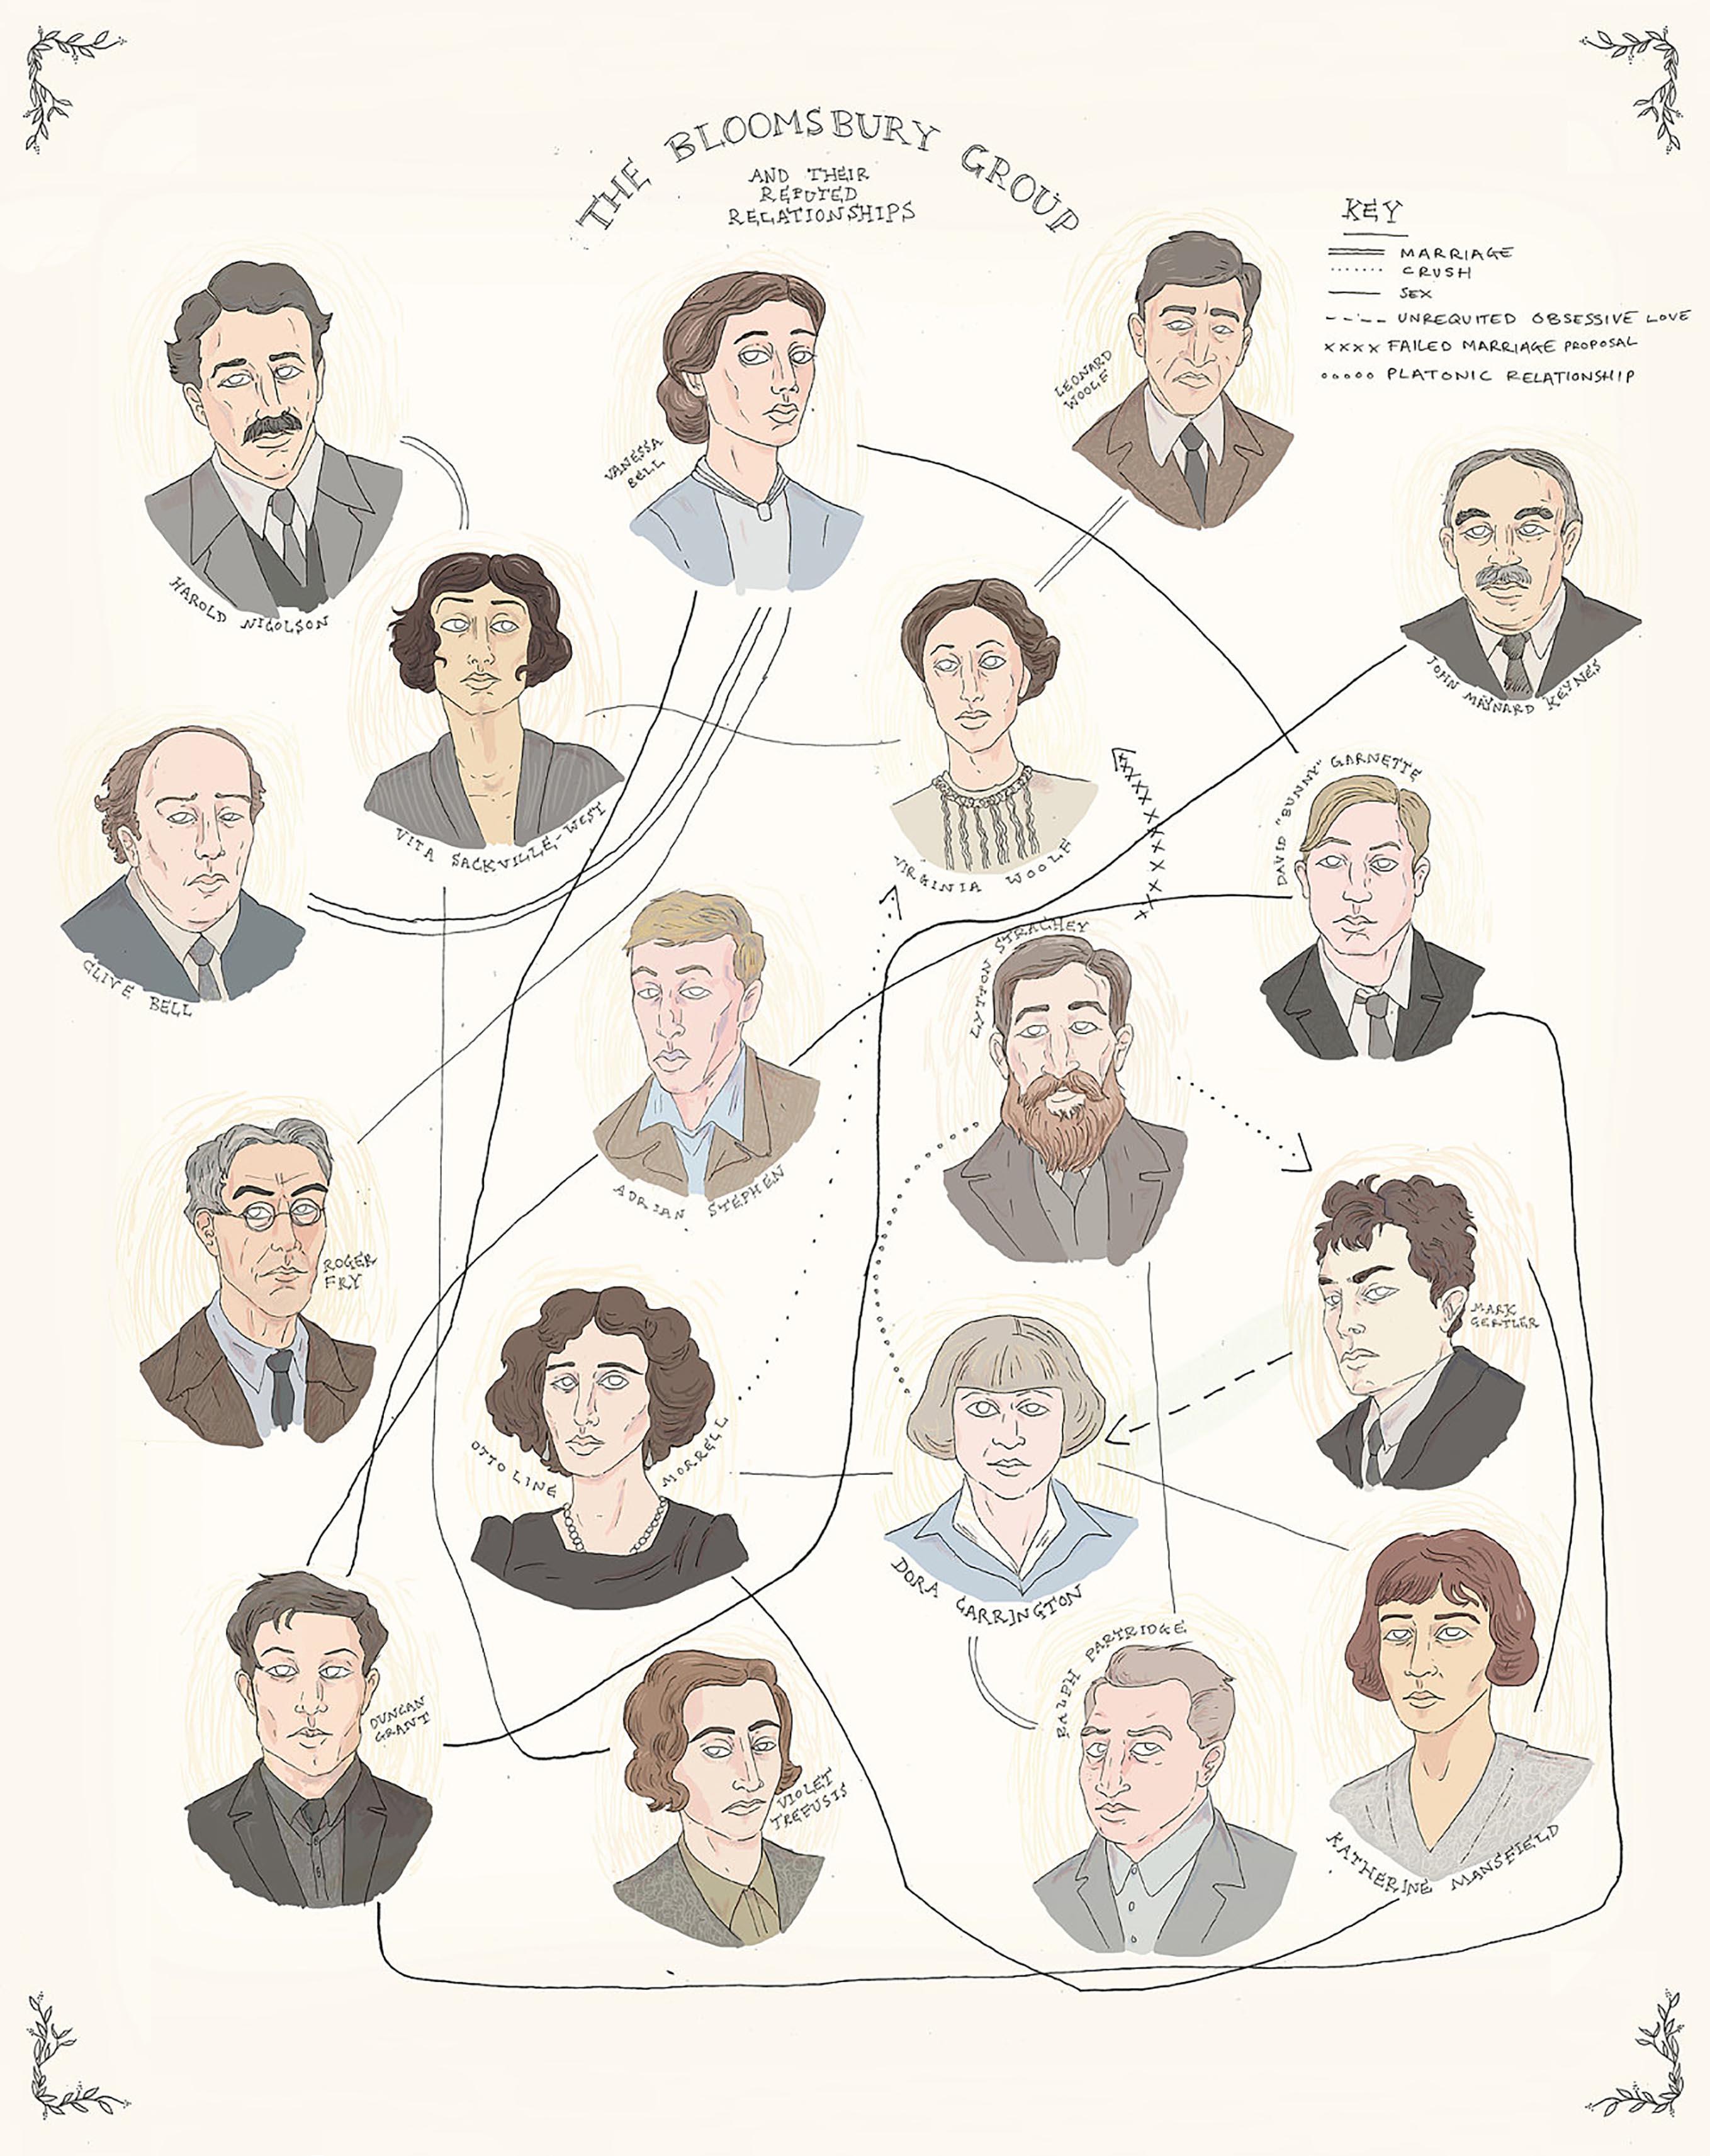 Bloomsburygruppens relationskarta. Bild: Flow Magazine